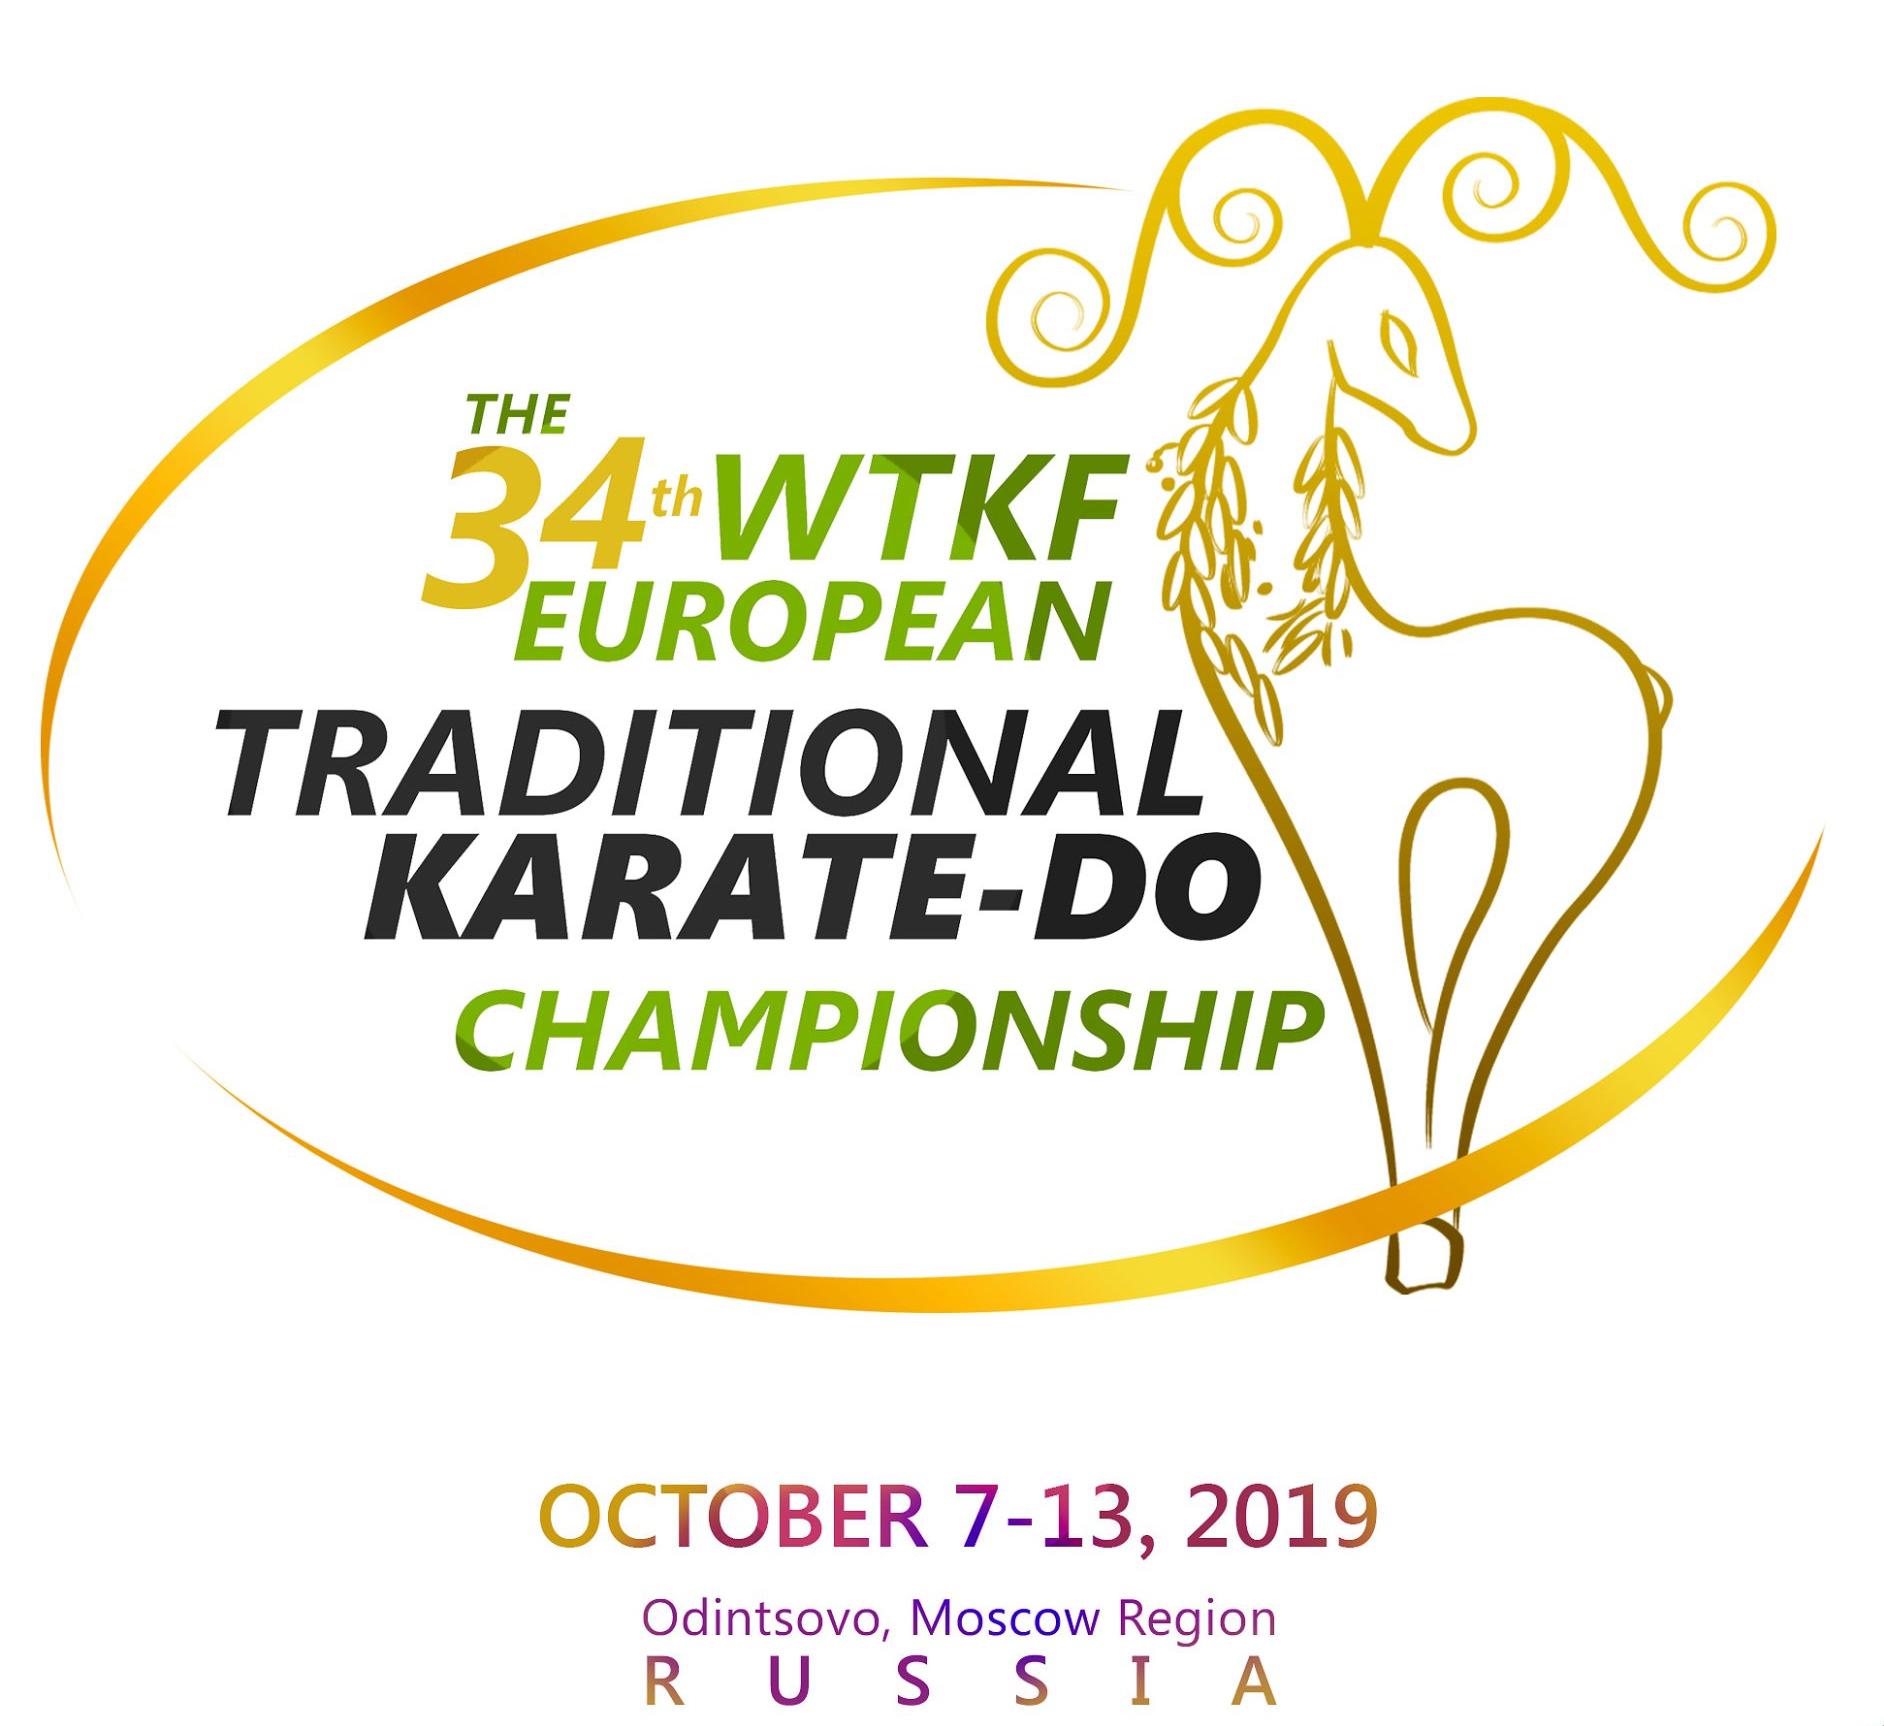 34th WTKF TRADITIONAL KARATE-DO EUROPEAN CHAMPIONSHIP